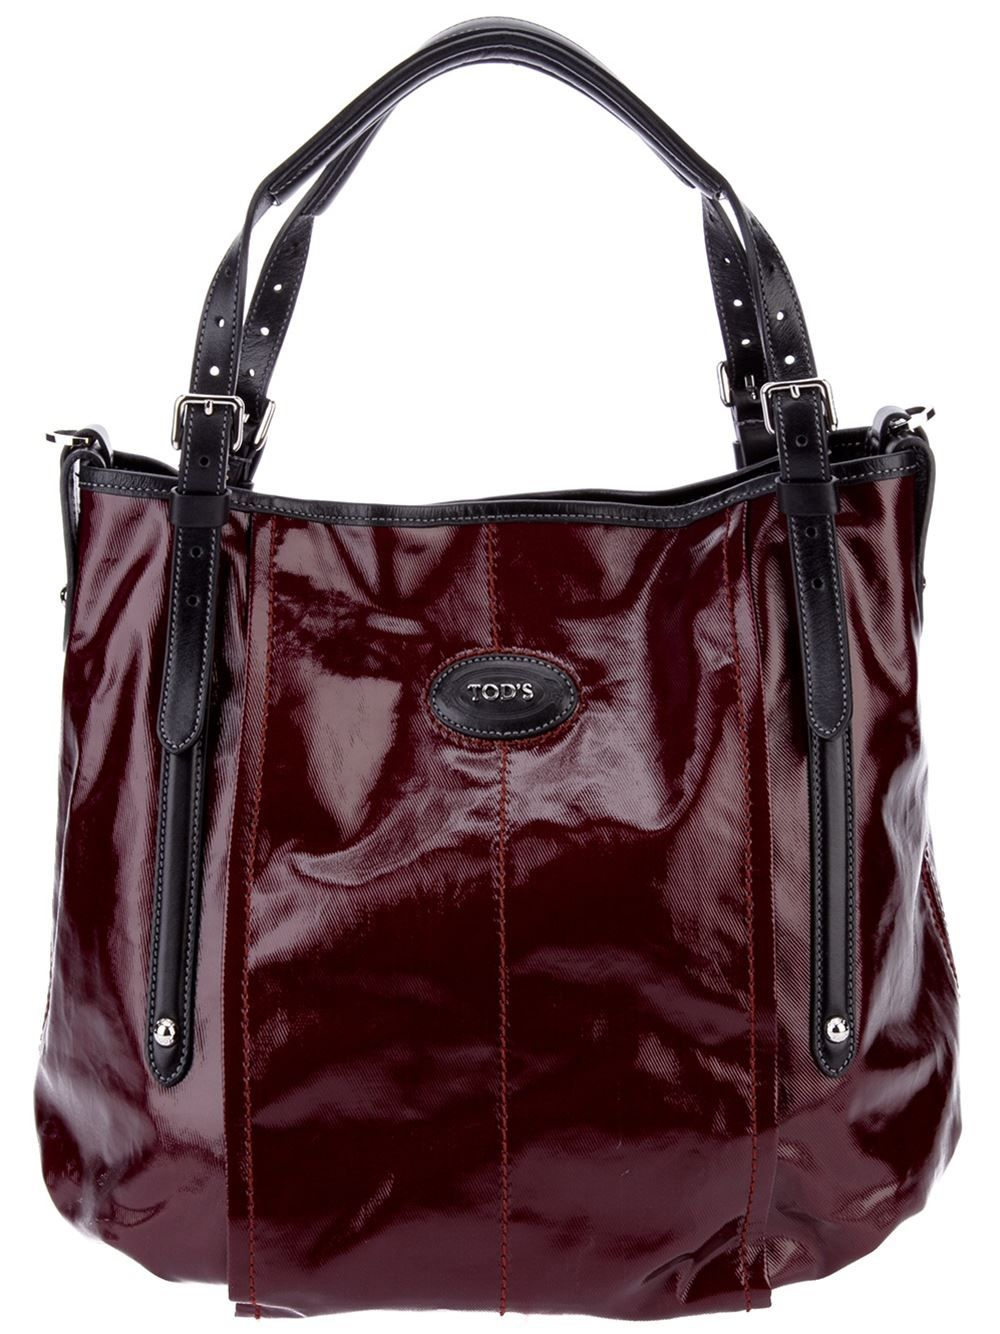 Best Handbag Brands In World